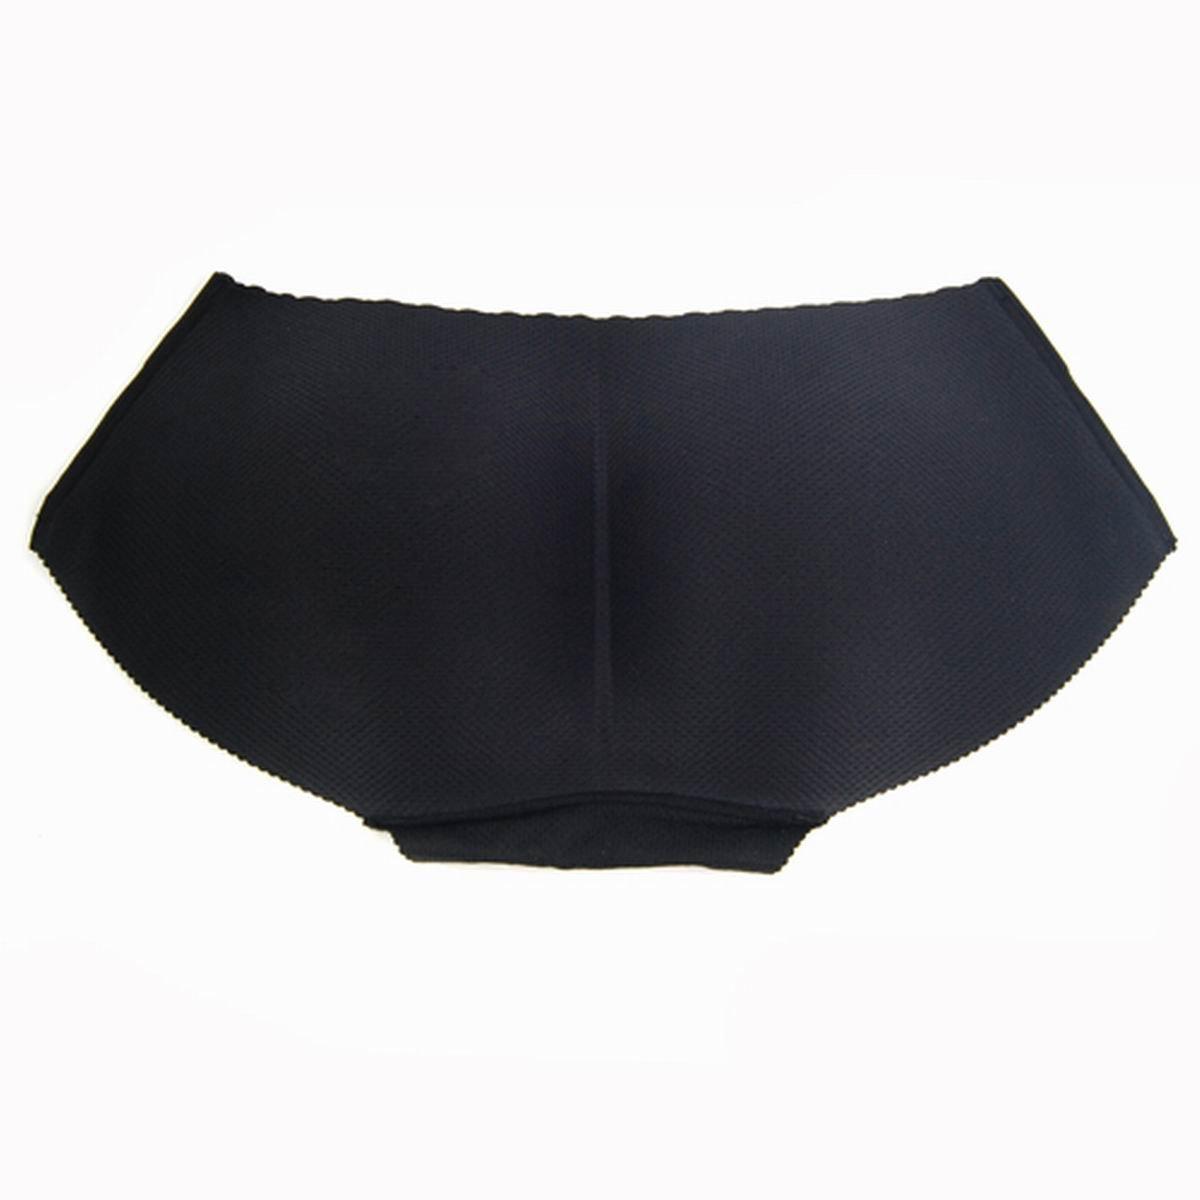 Yahee365 Push-Up Mieder Panty Contur Slip Unterhose Unterwäsche